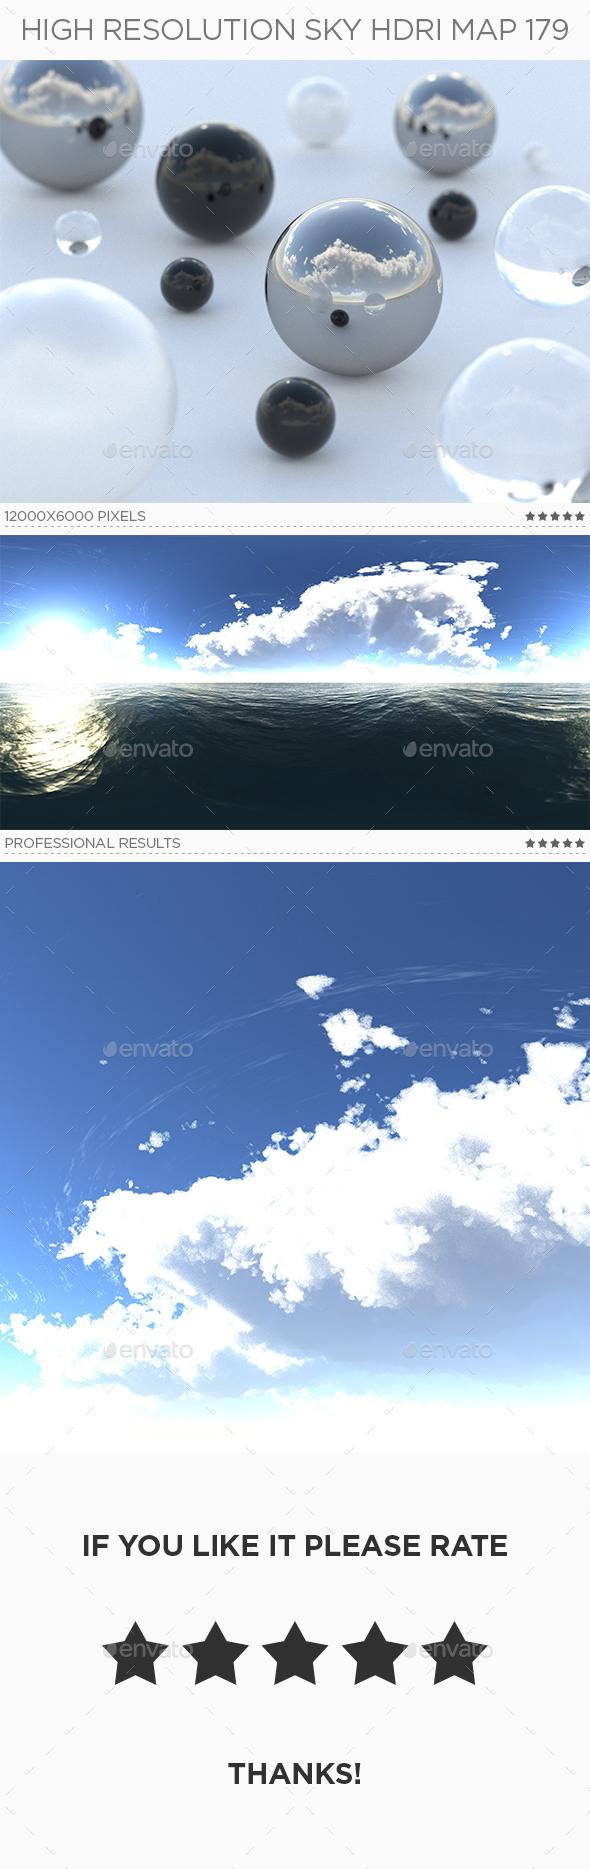 High Resolution Sky HDRi Map 179 - 3DOcean Item for Sale